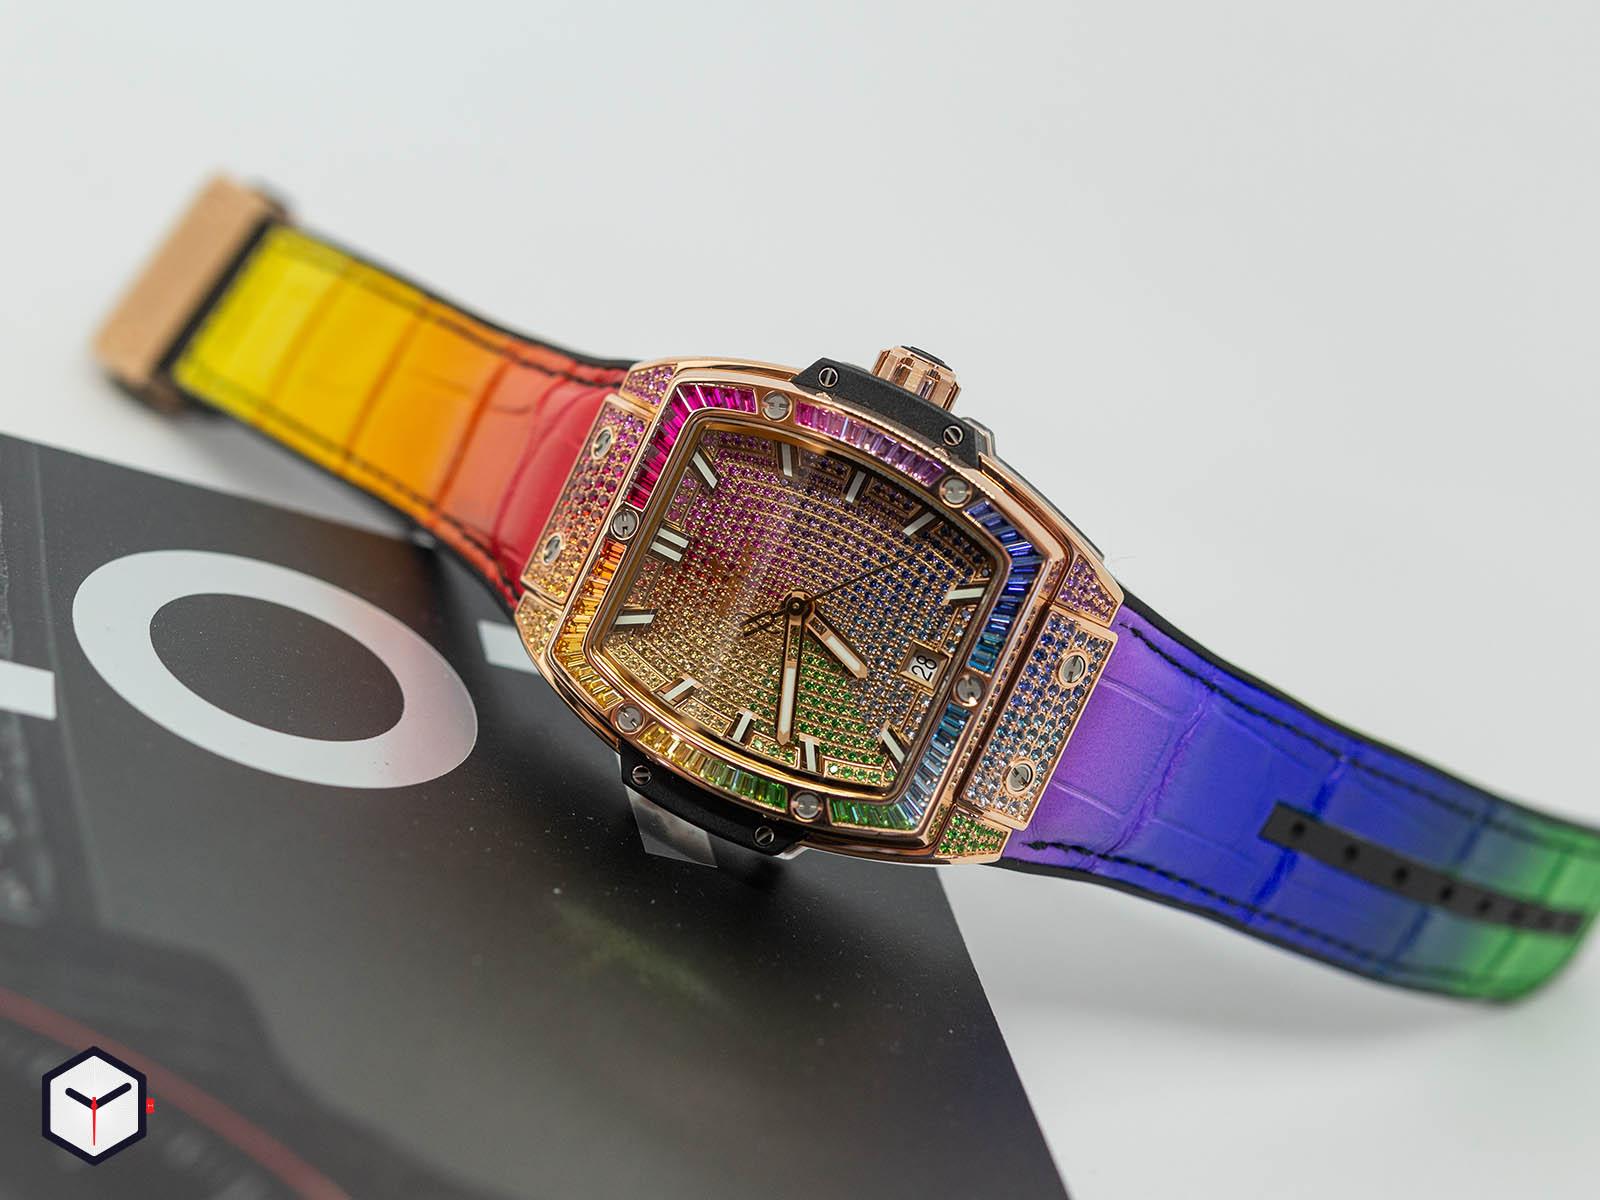 665-ox-9910-lr-0999-hublot-spirit-of-big-bang-king-gold-rainbow-39-mm-2.jpg